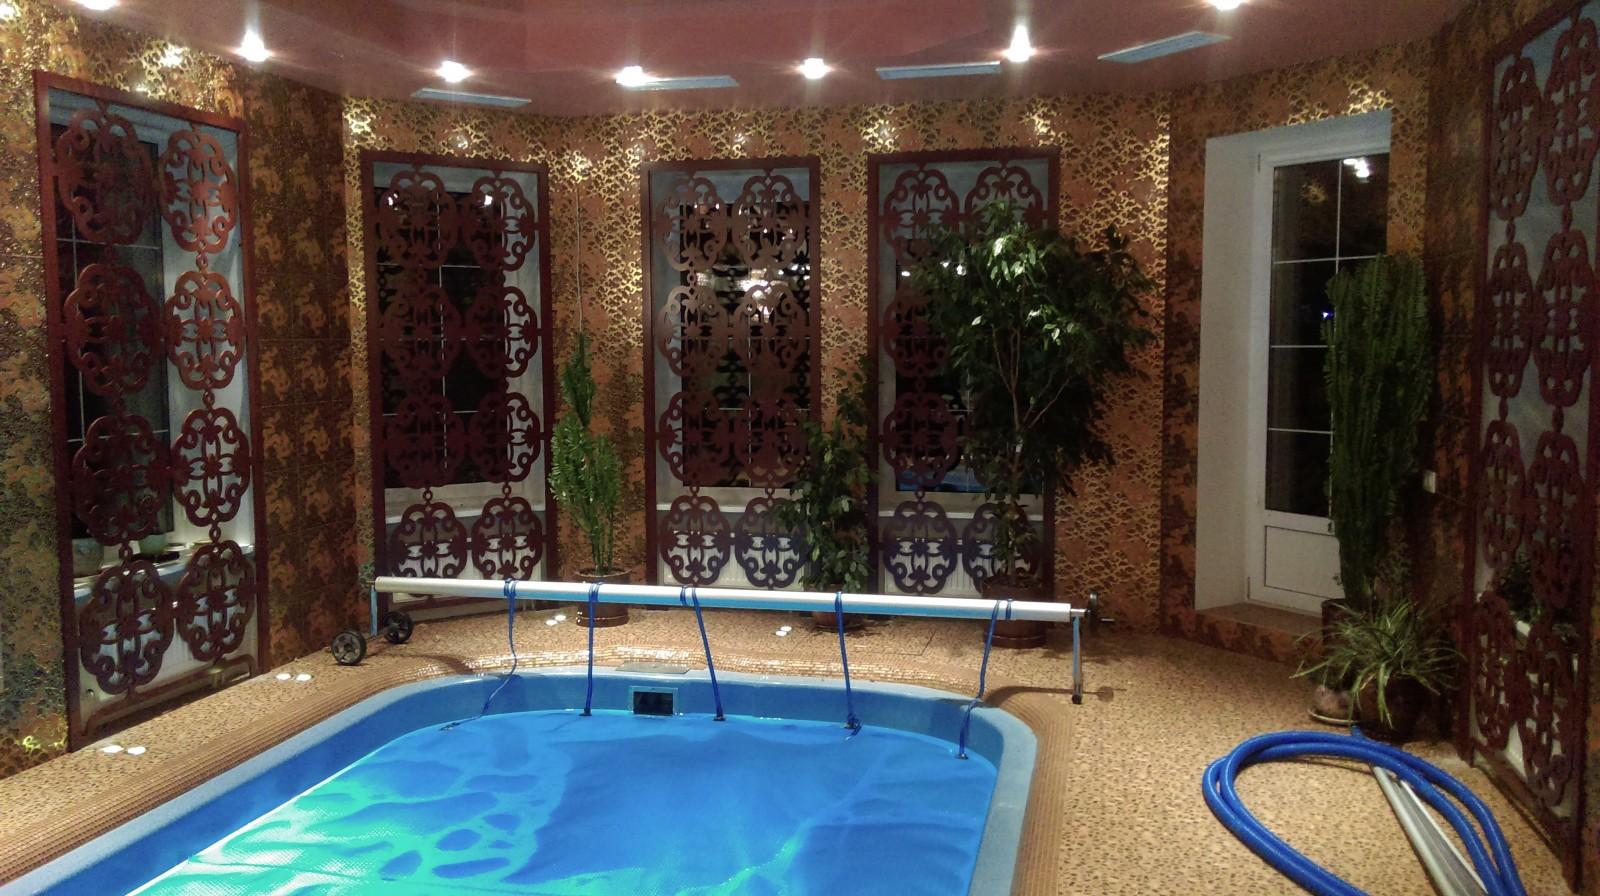 Элегантные ширмы для бассейна